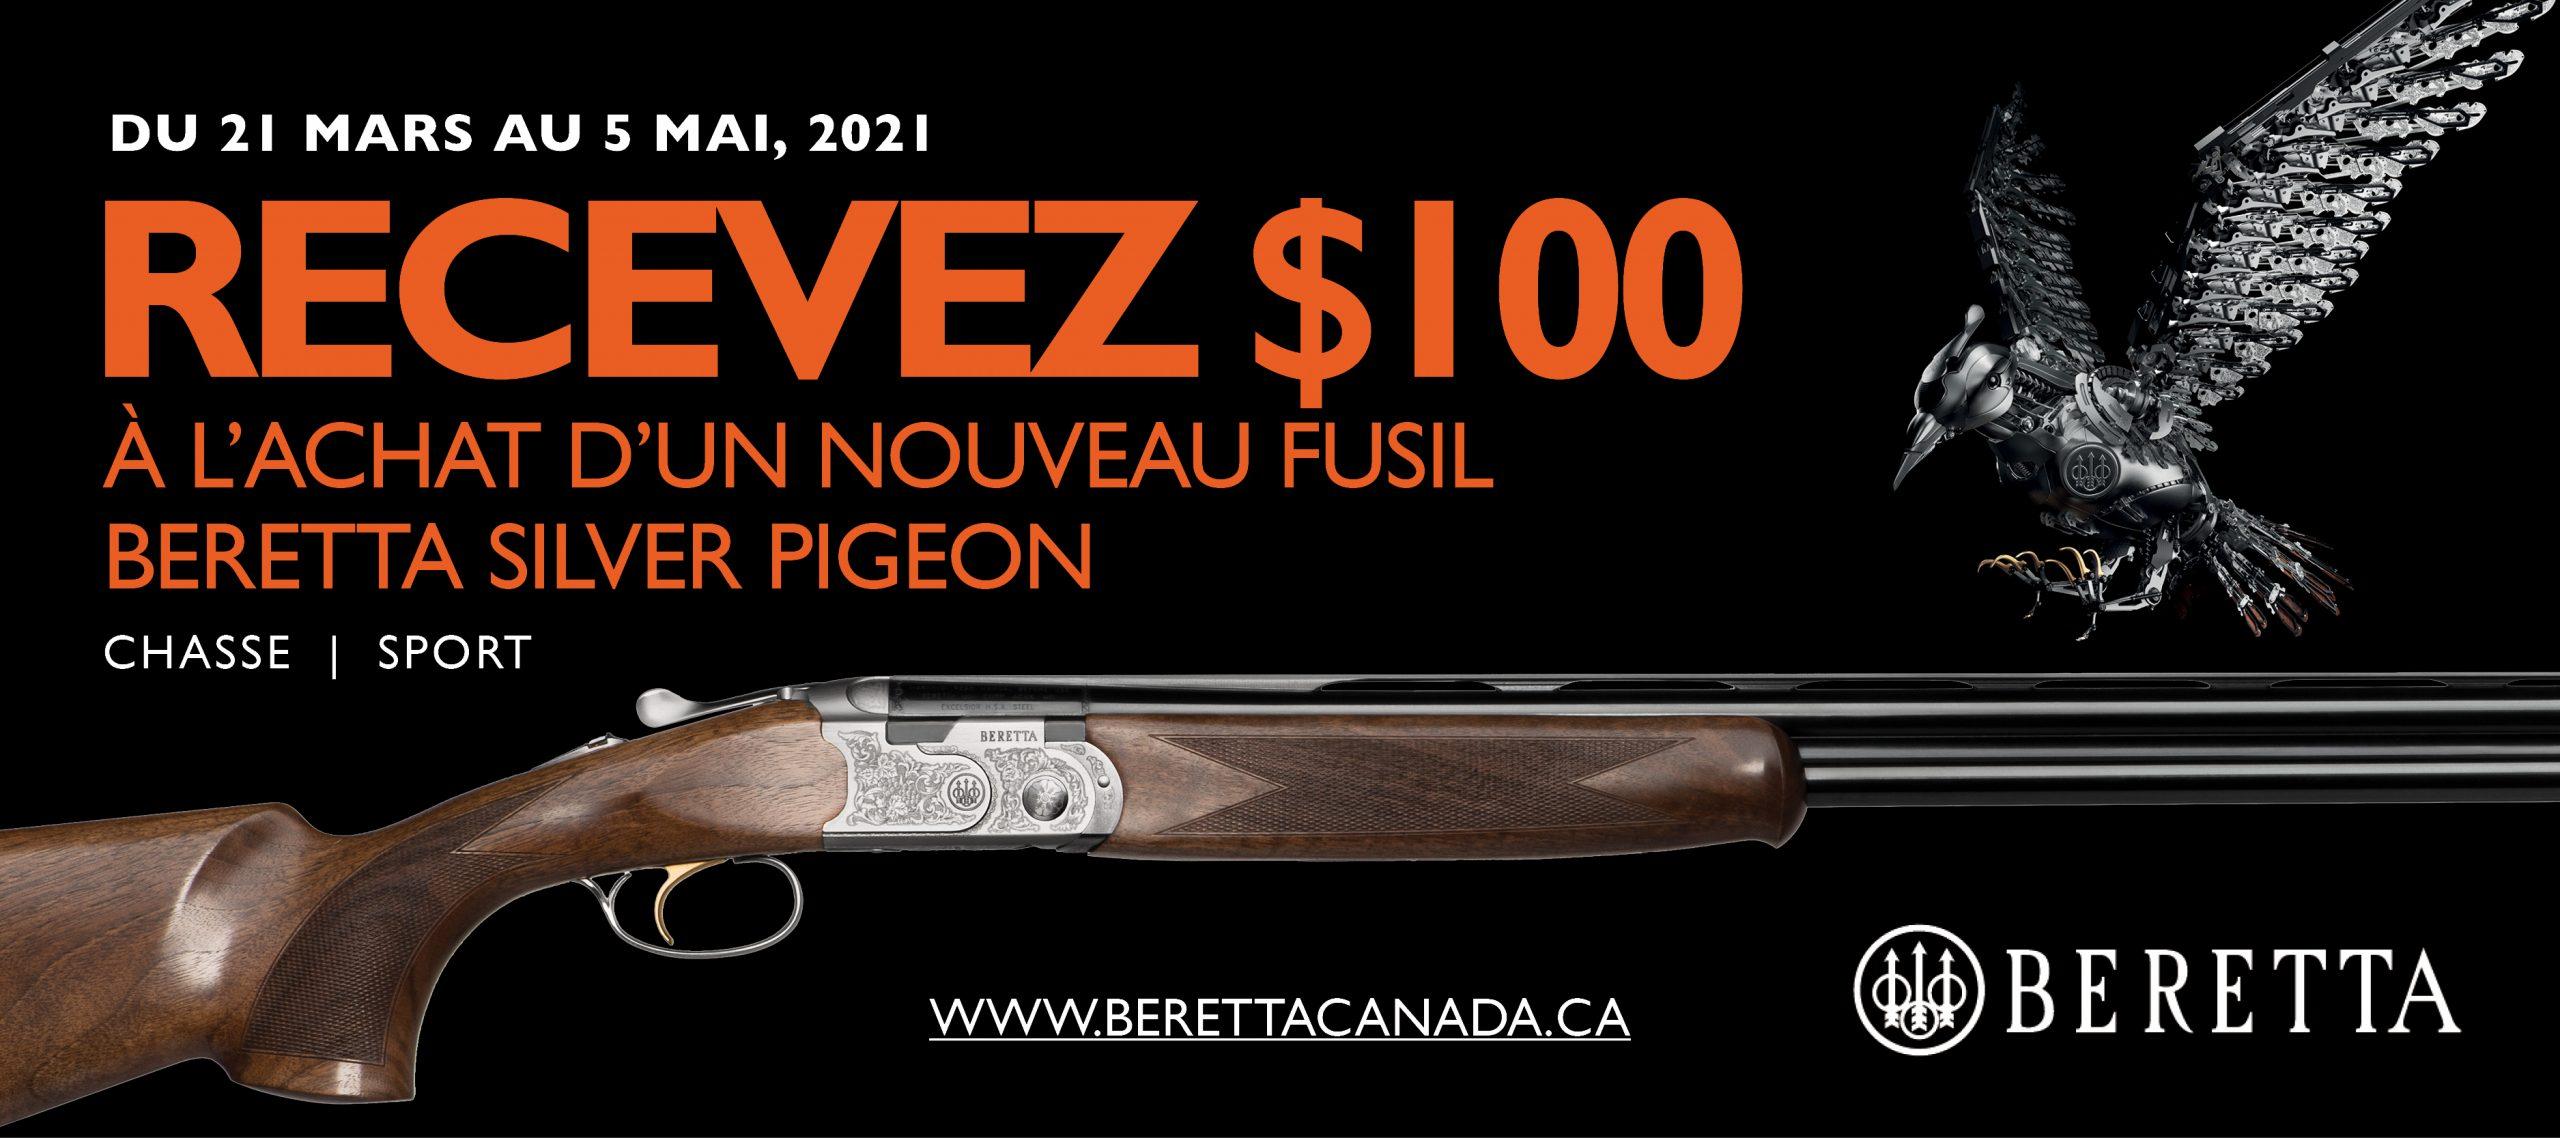 Beretta 100 Off SP Promotion 2021 Banner 400x900 FR